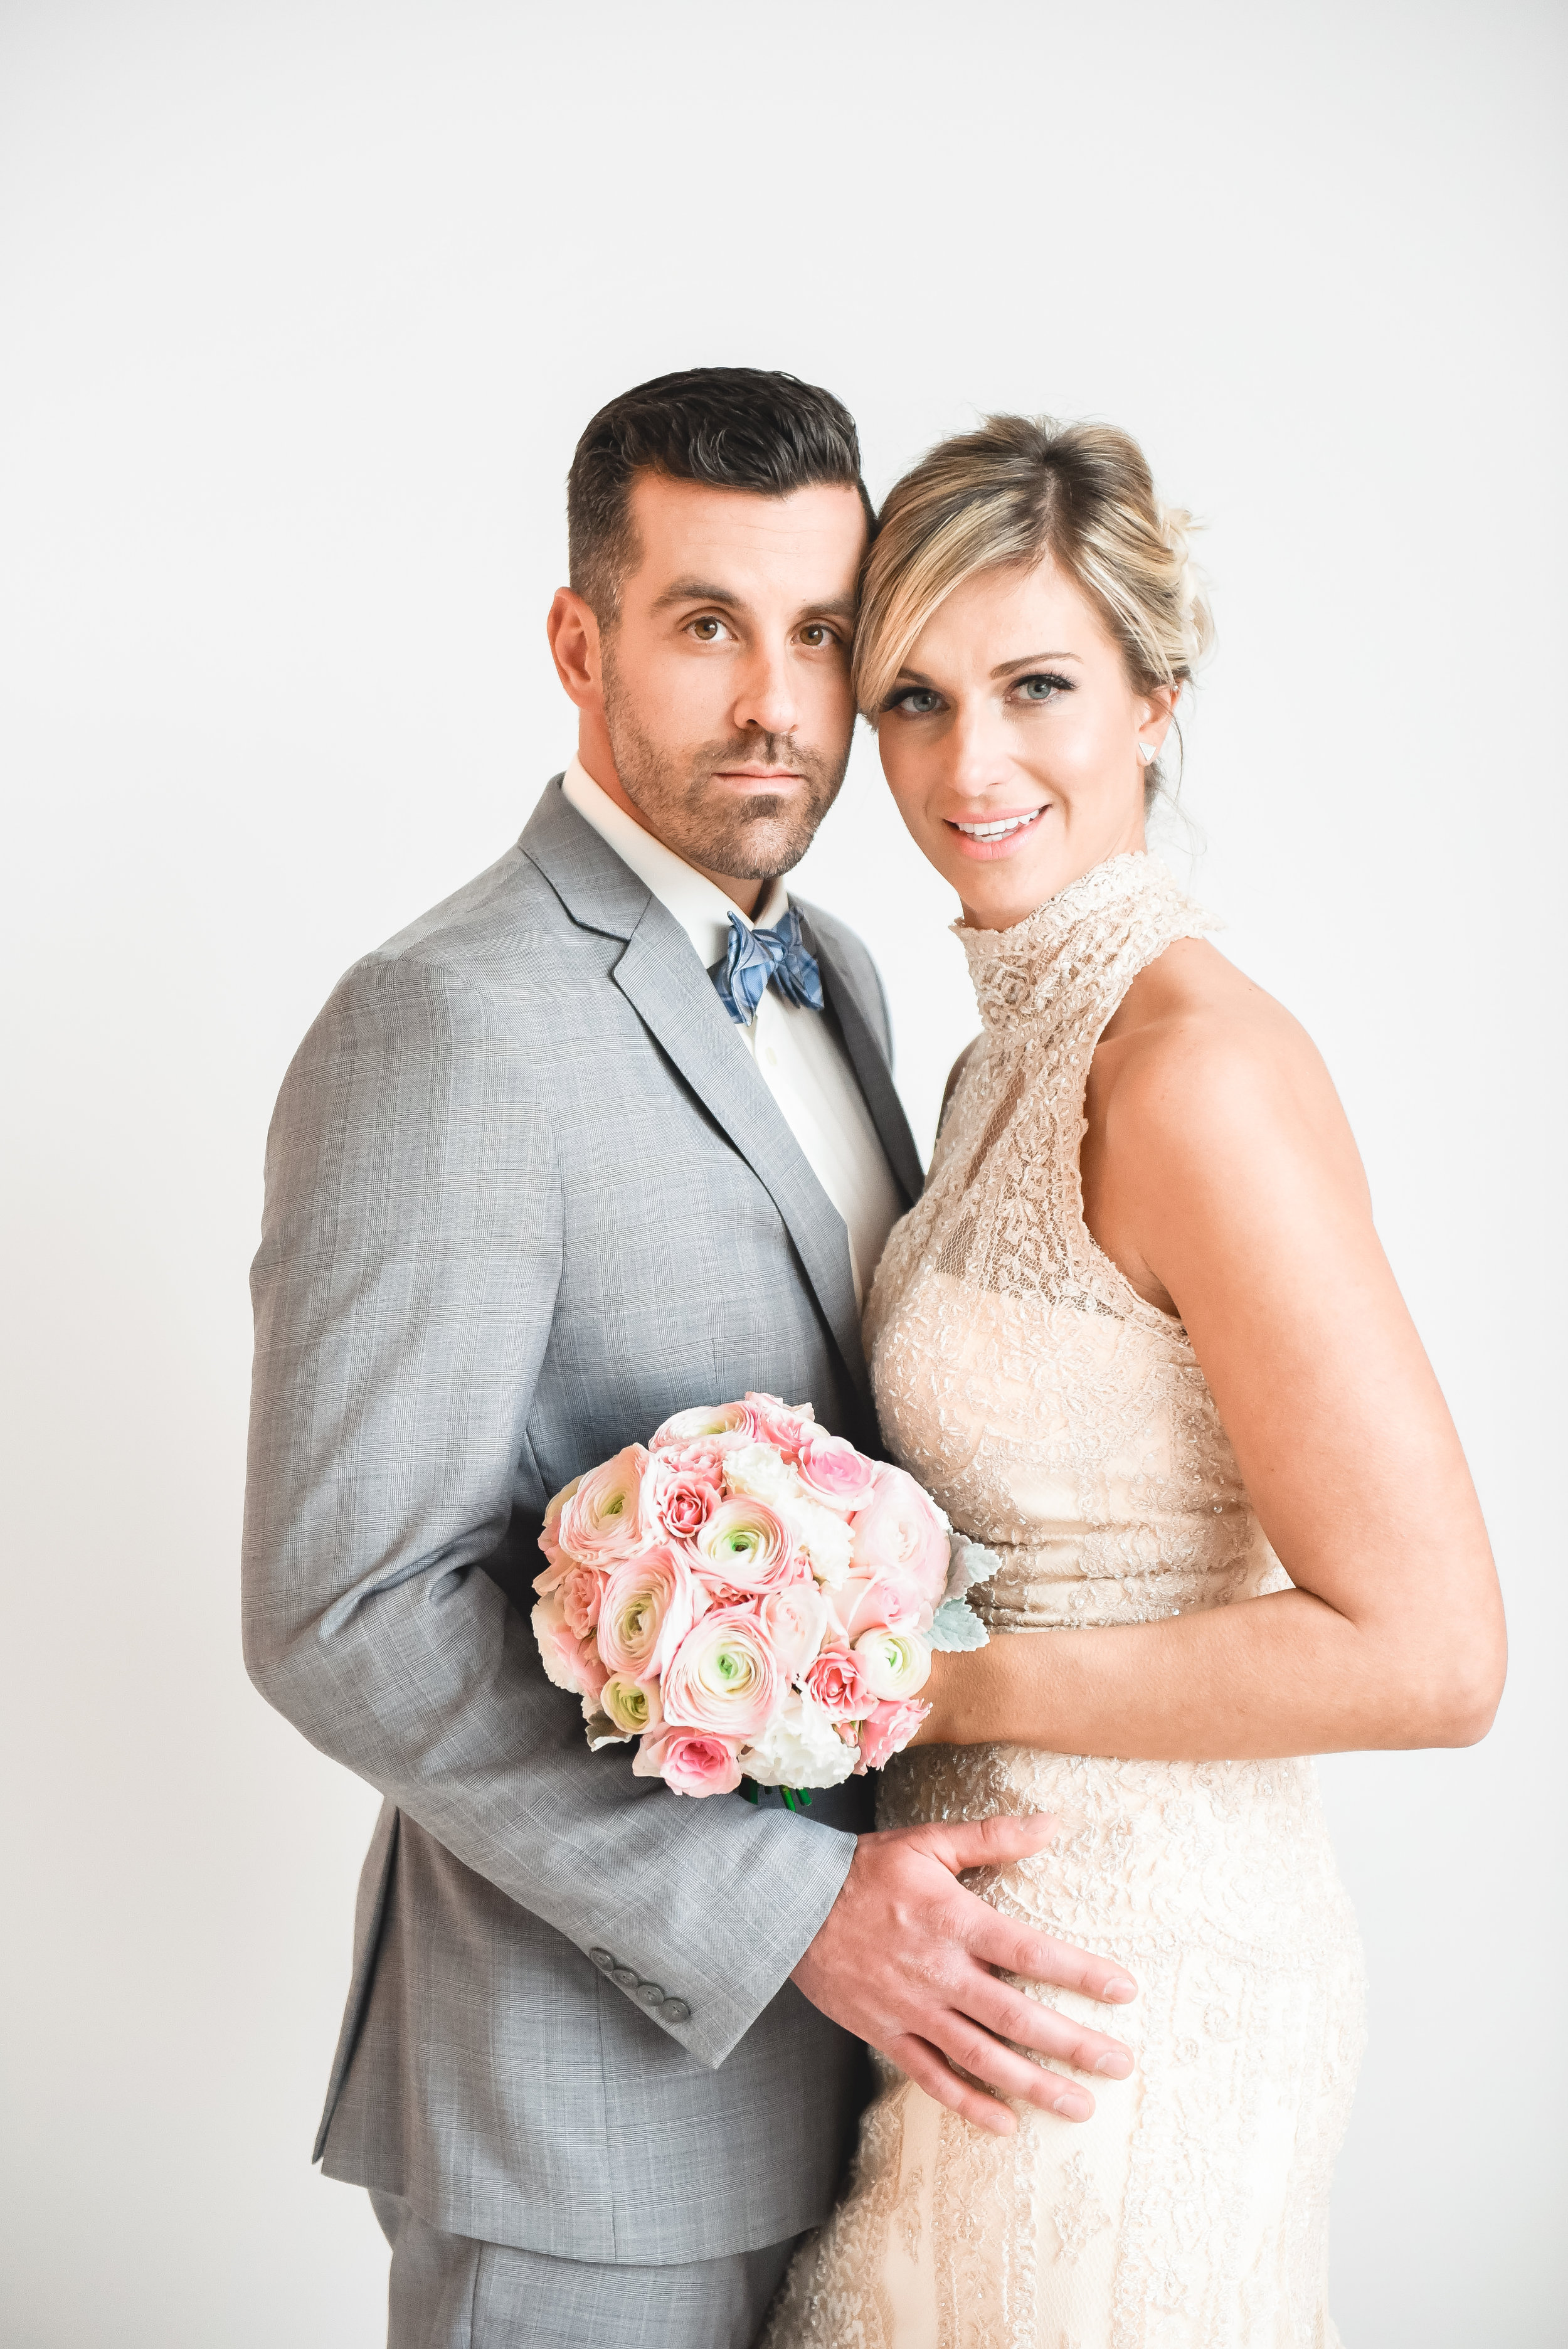 Julie Nicole Weddings . Model Jeff and Michelle of Maeck Weddings . Flowers by La Petite Fleur